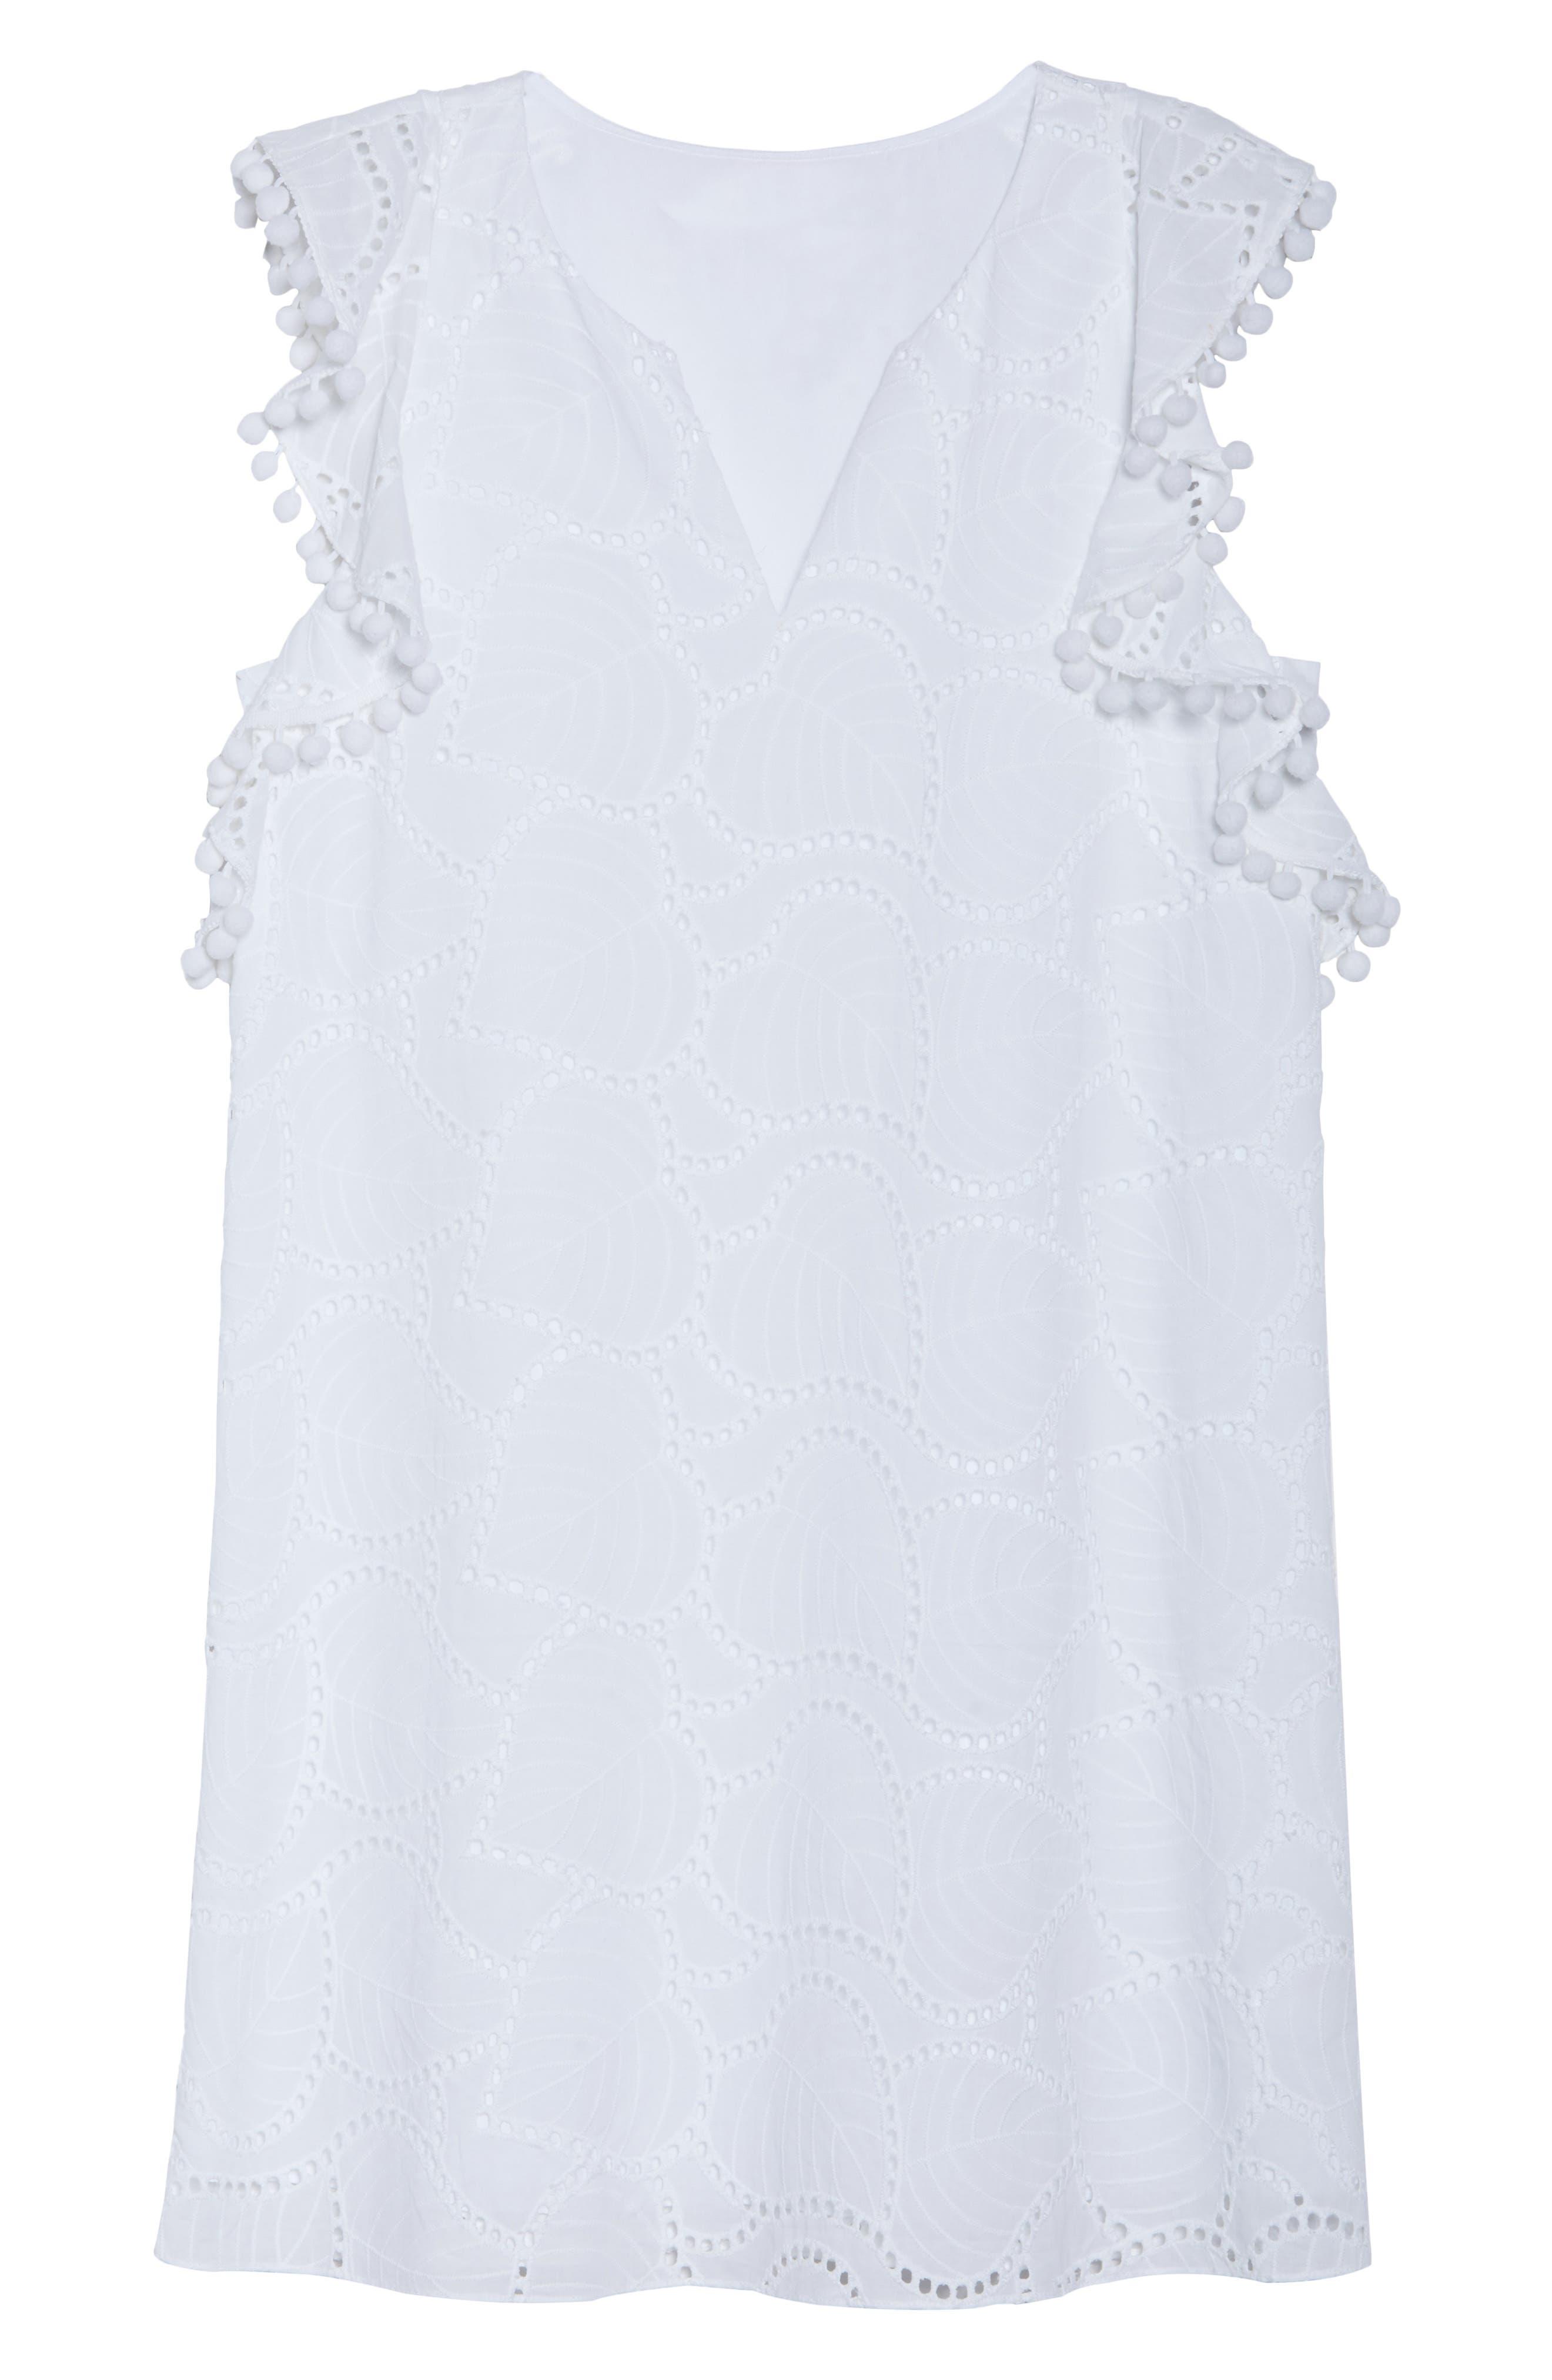 Astara Cotton Eyelet Dress,                             Alternate thumbnail 7, color,                             Resort White Leaf Eyelet